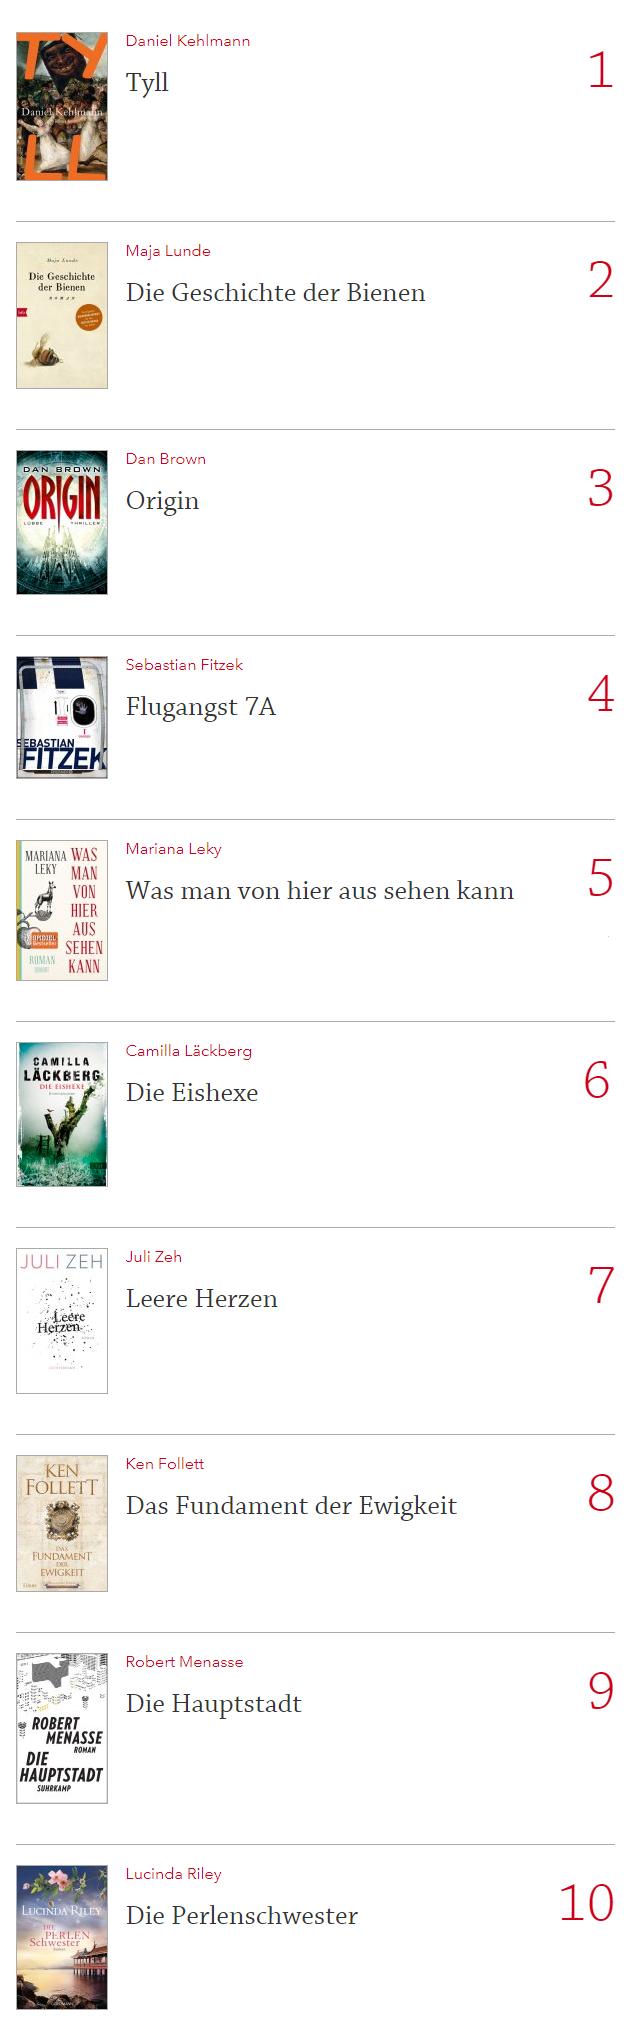 Los 10 Bestseller en Alemania